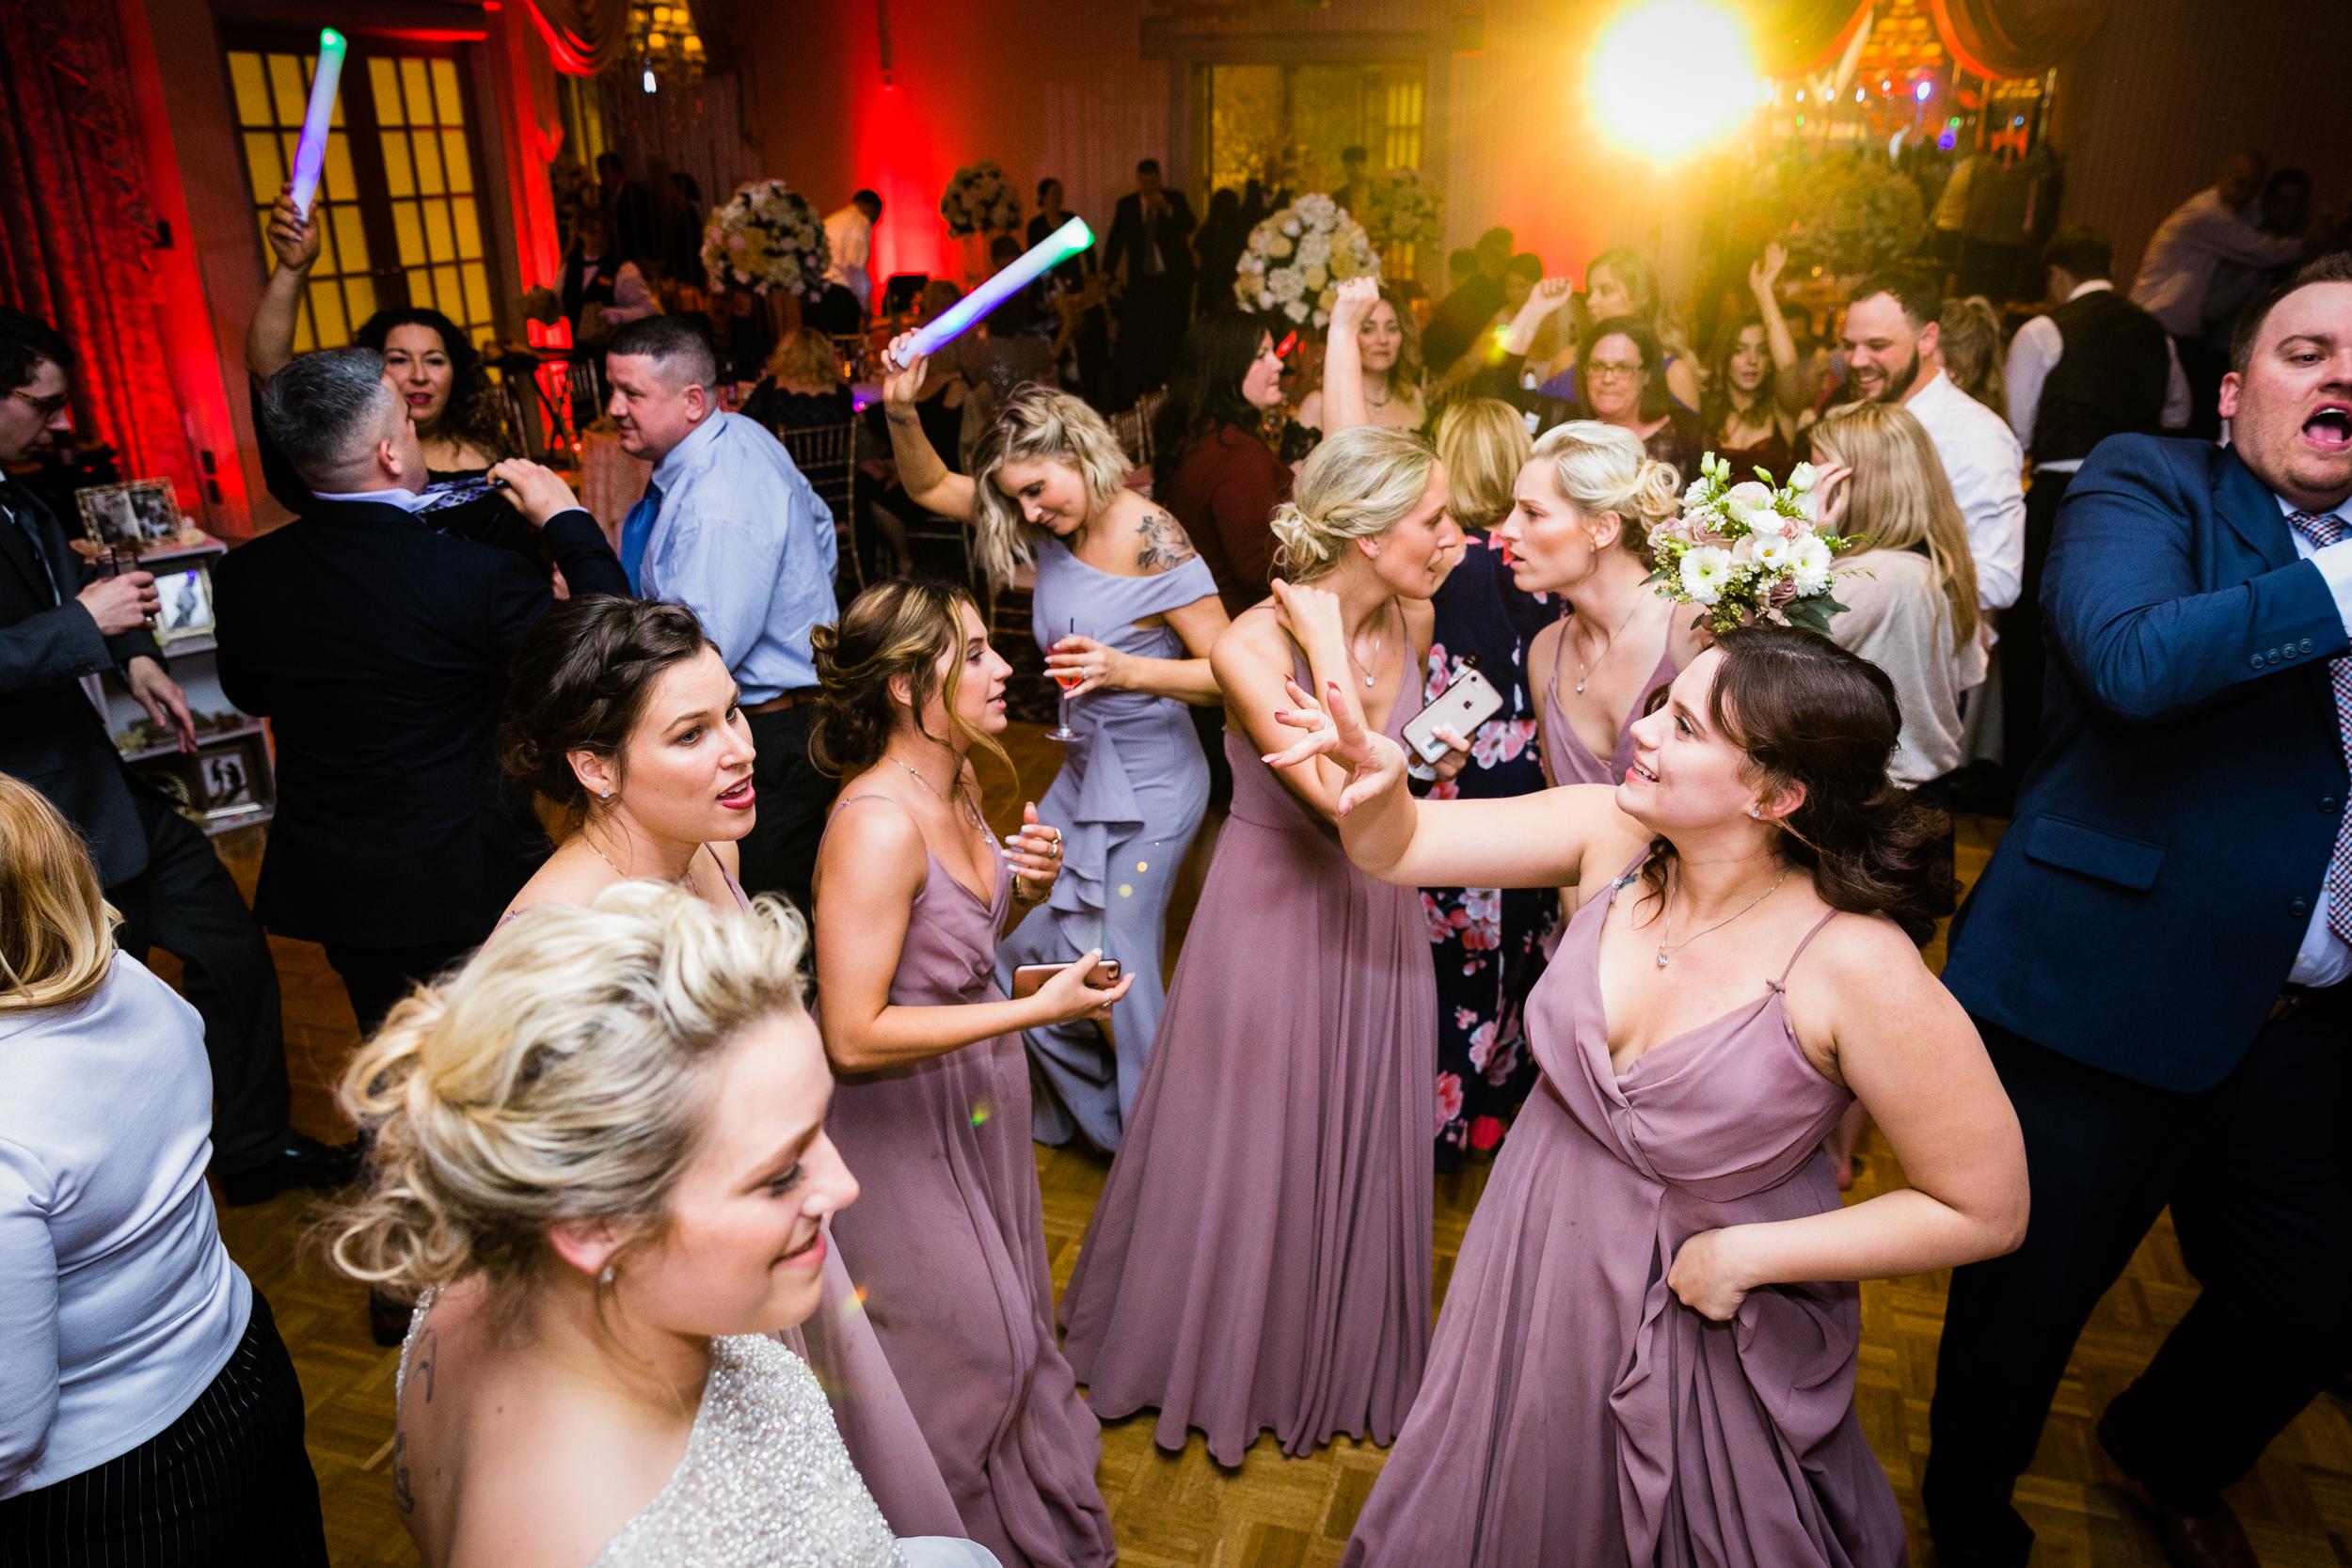 CELEBRATIONS BENSALEM WEDDING PHOTOGRAPHY-120.jpg